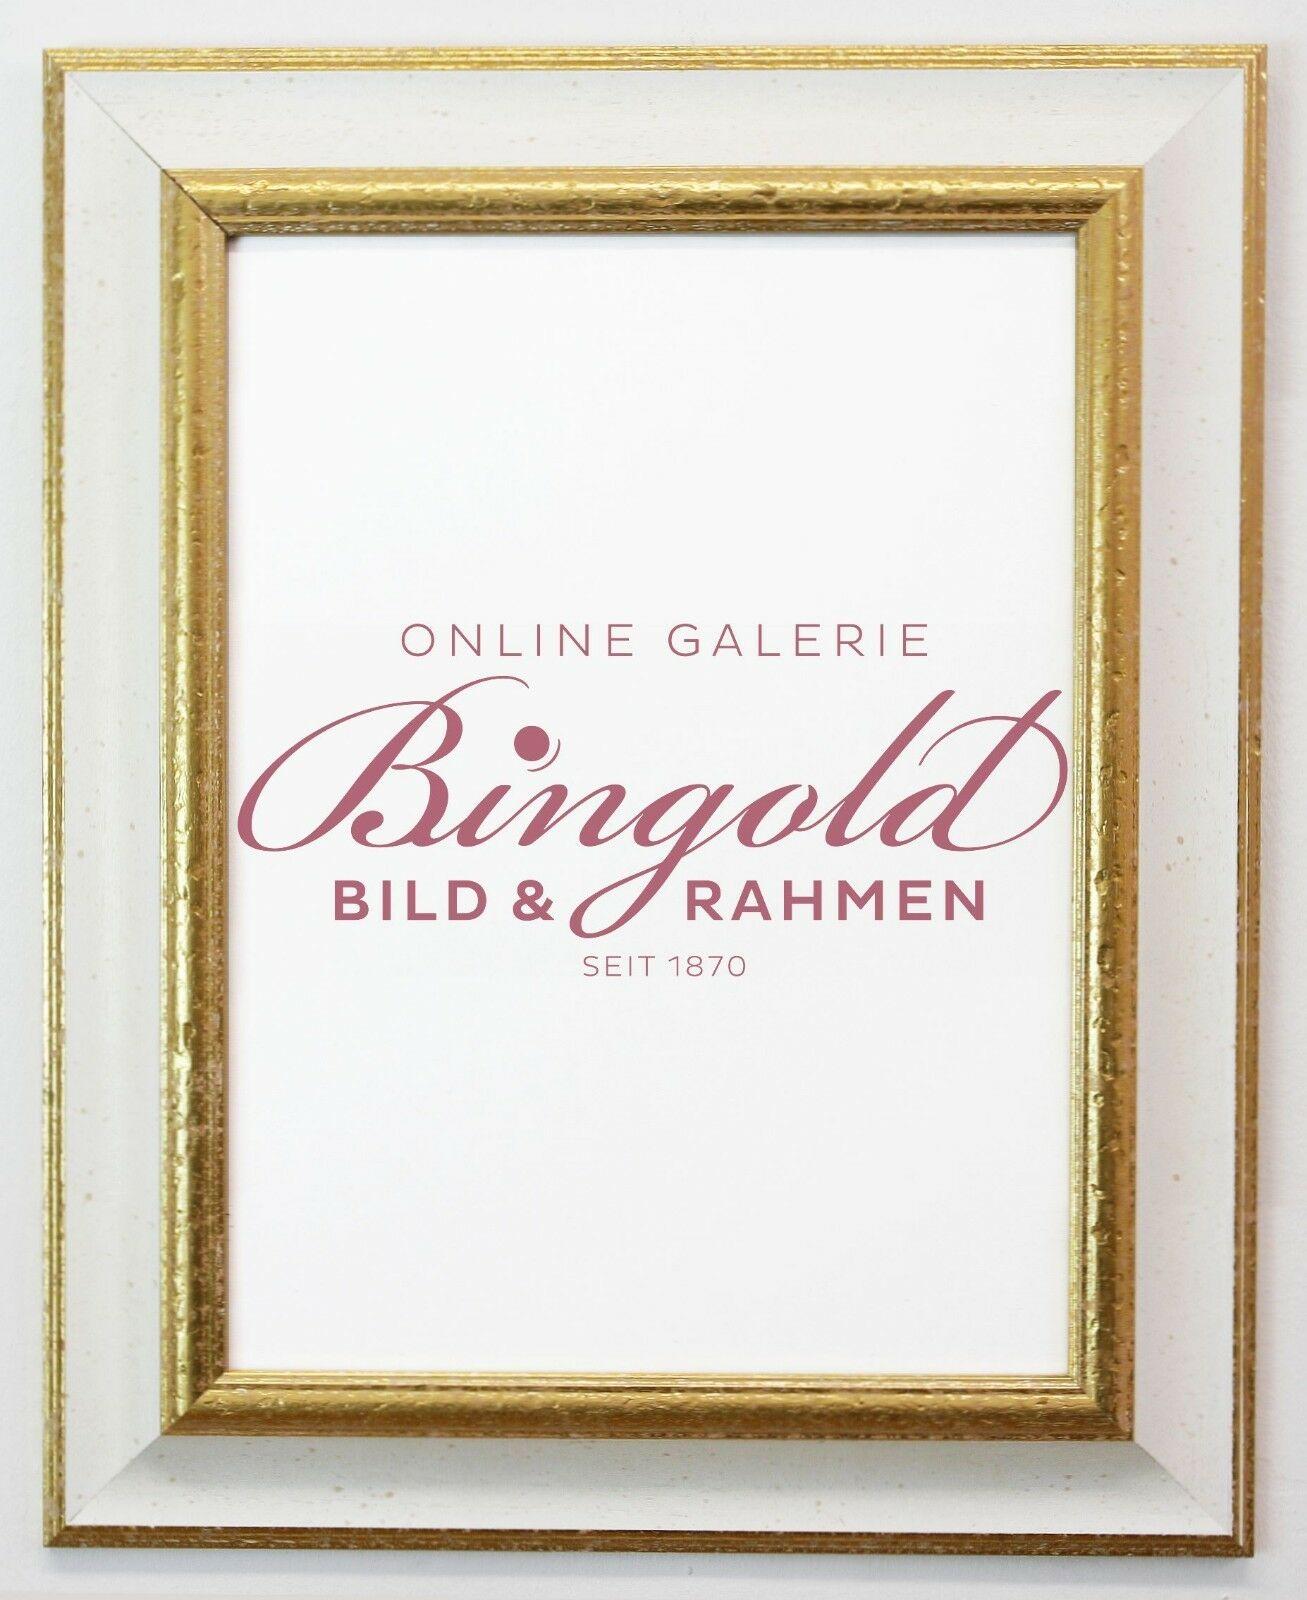 Dekoration Bilderrahmen Weiß Gold Antik Barock Foto Urkunden